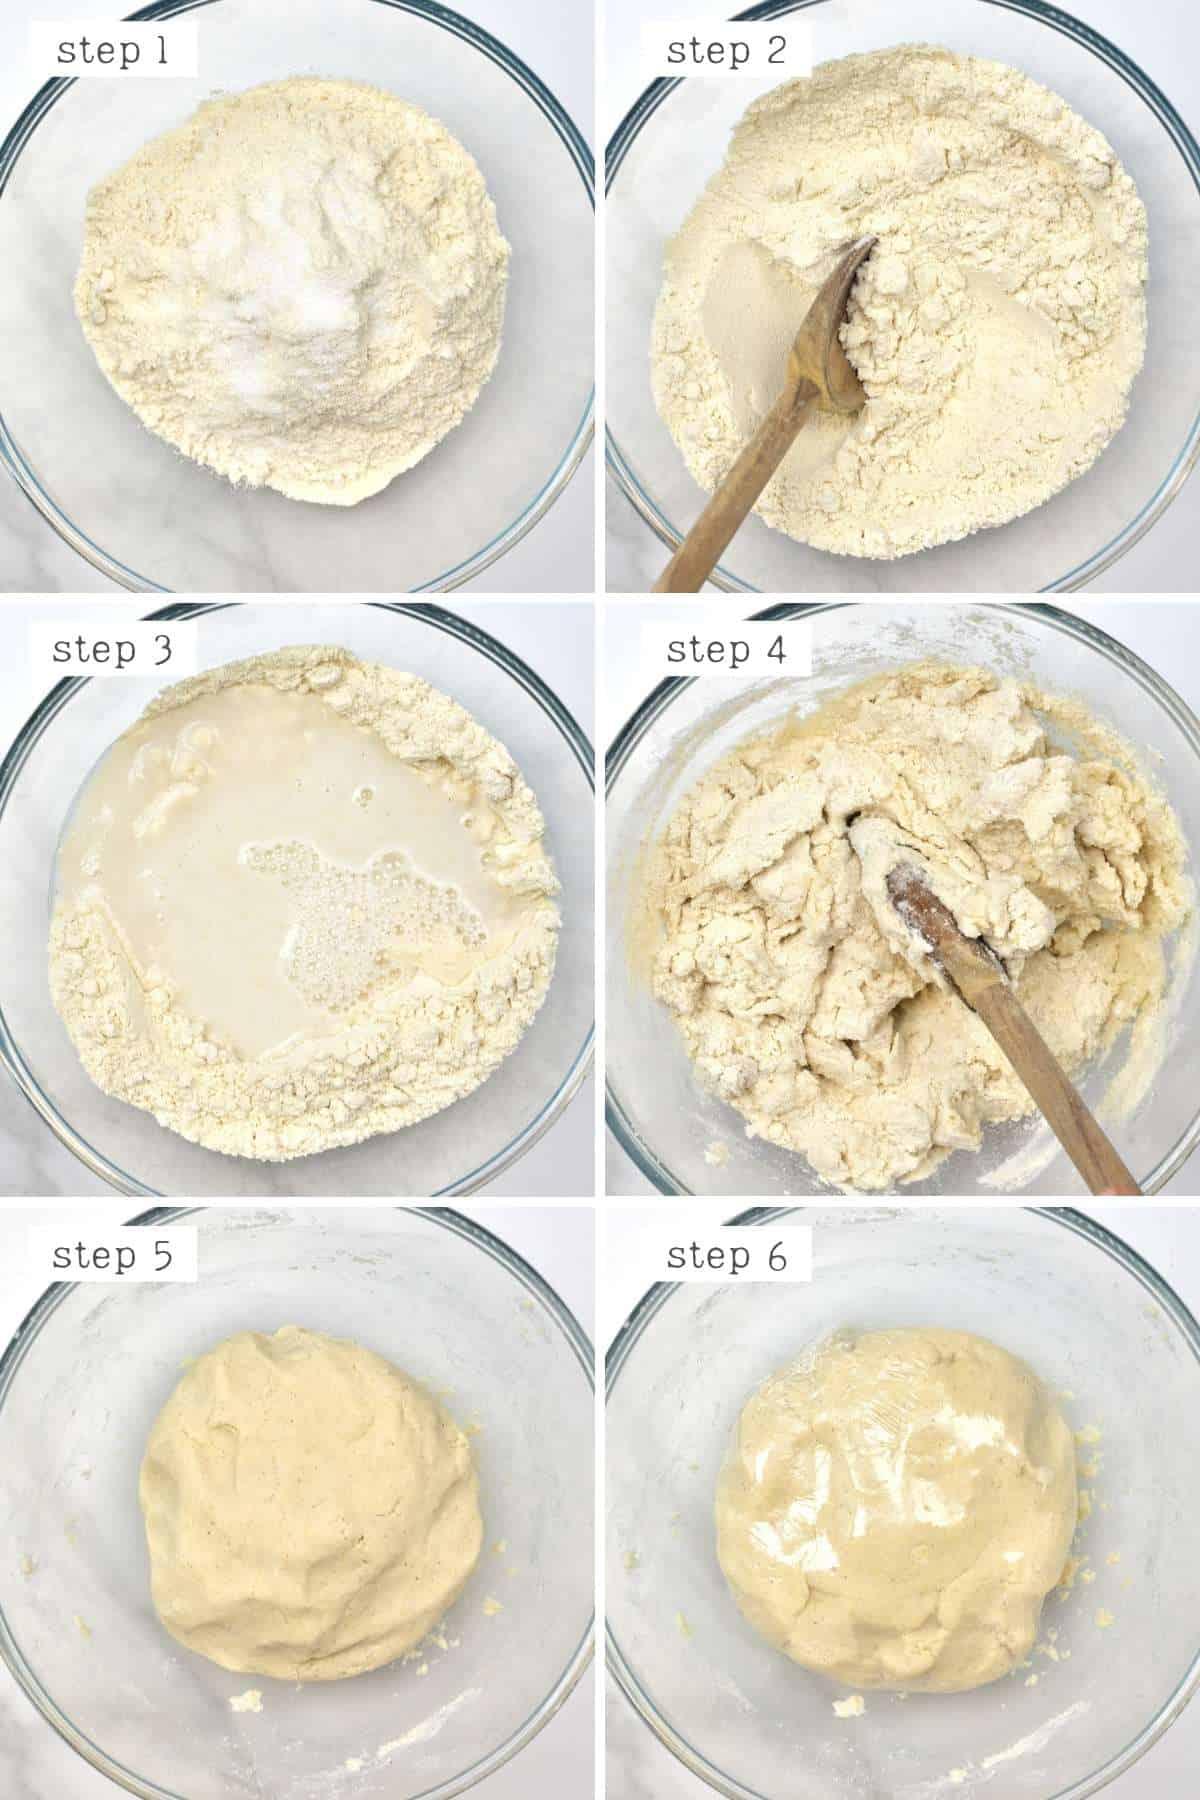 Steps for making corn tortilla dough